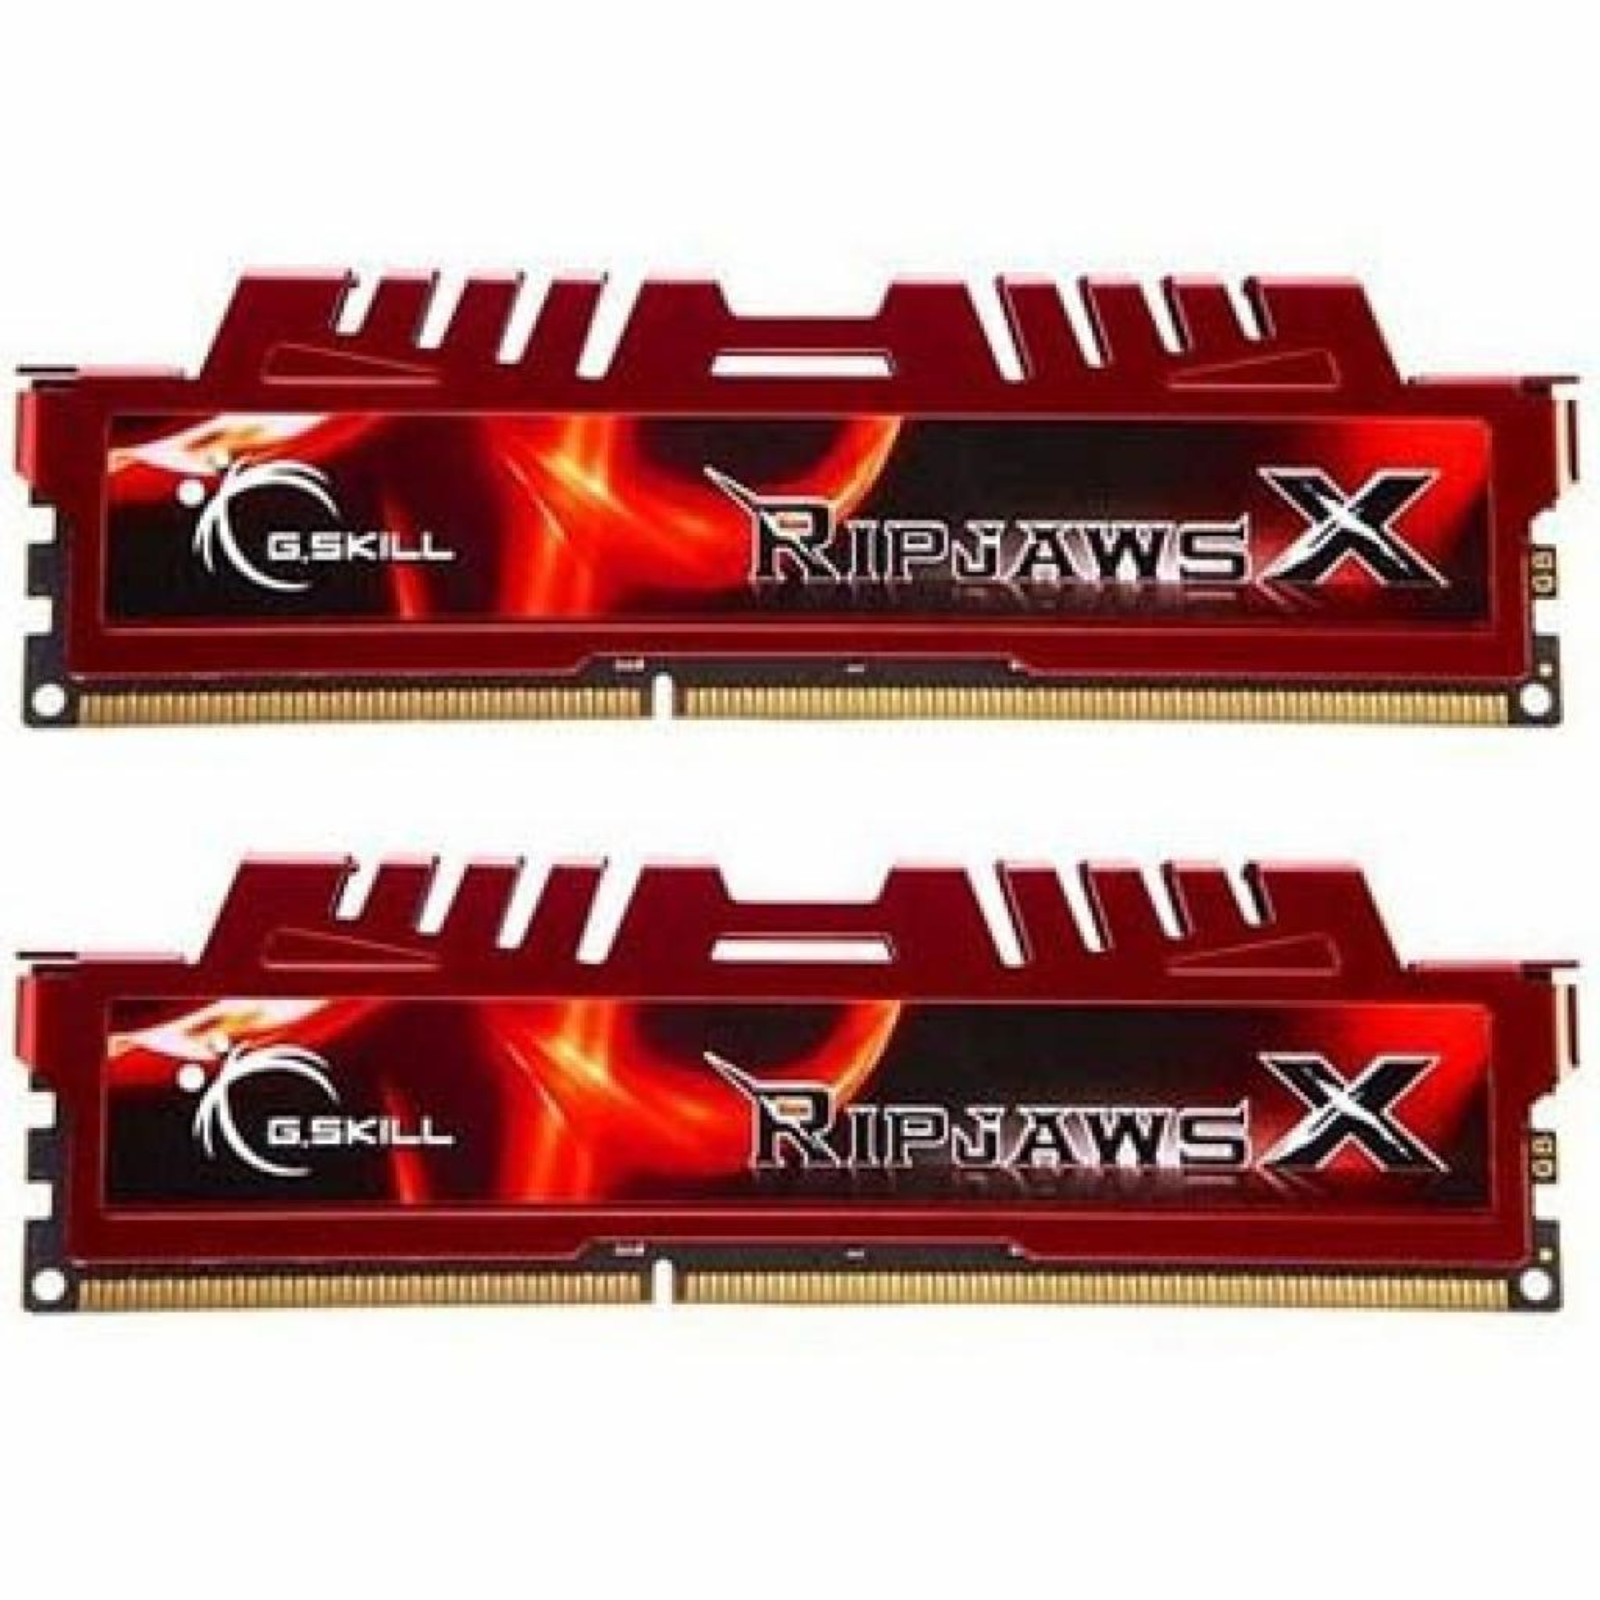 Модуль памяти для компьютера DDR3 8GB (2x4GB) 2133 MHz G.Skill (F3-2133C9D-8GXL)